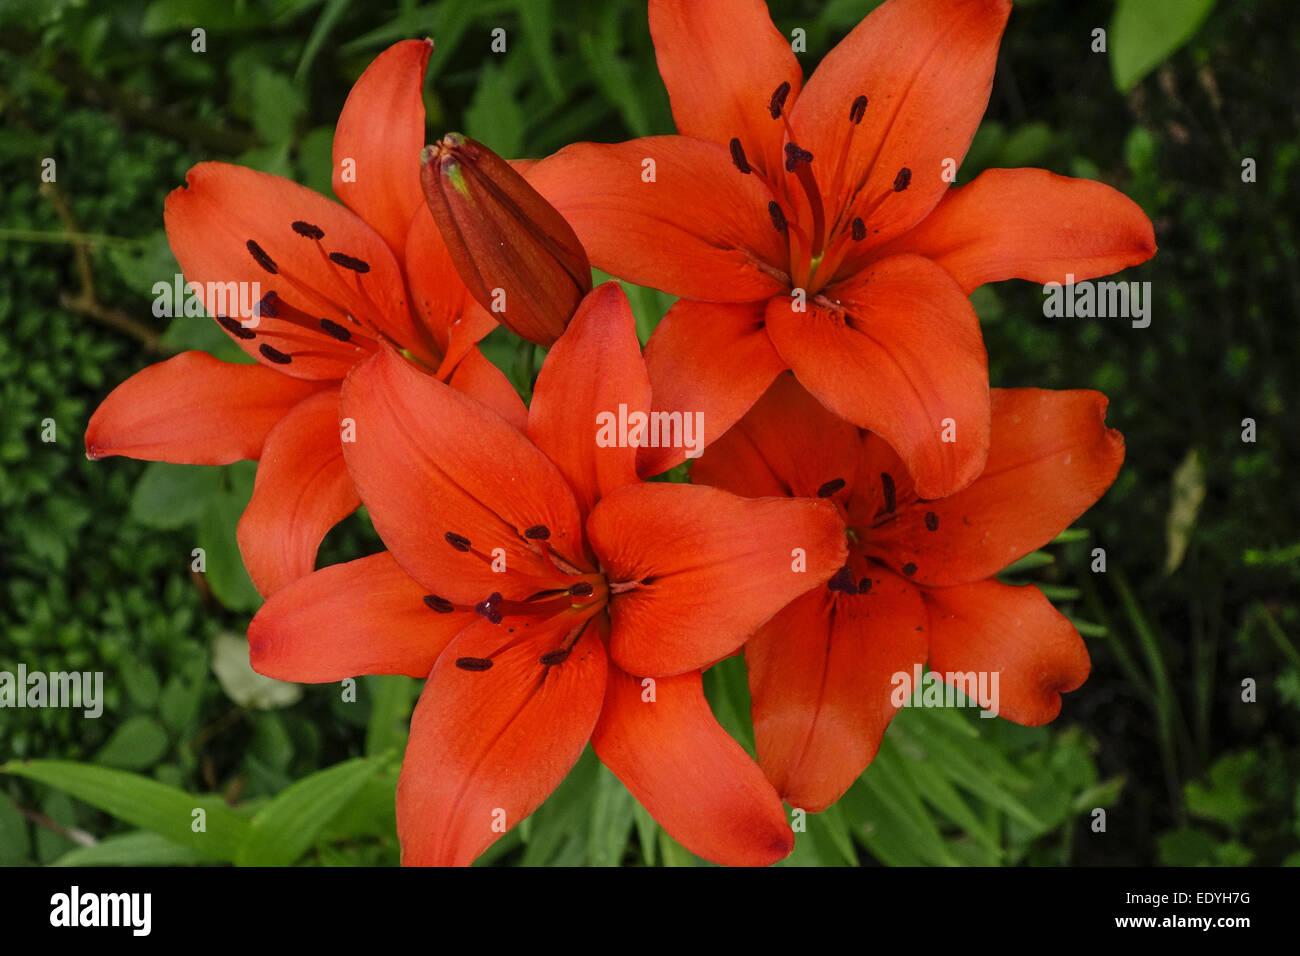 gartenblumen rote lilien garden flowers red lilies. Black Bedroom Furniture Sets. Home Design Ideas